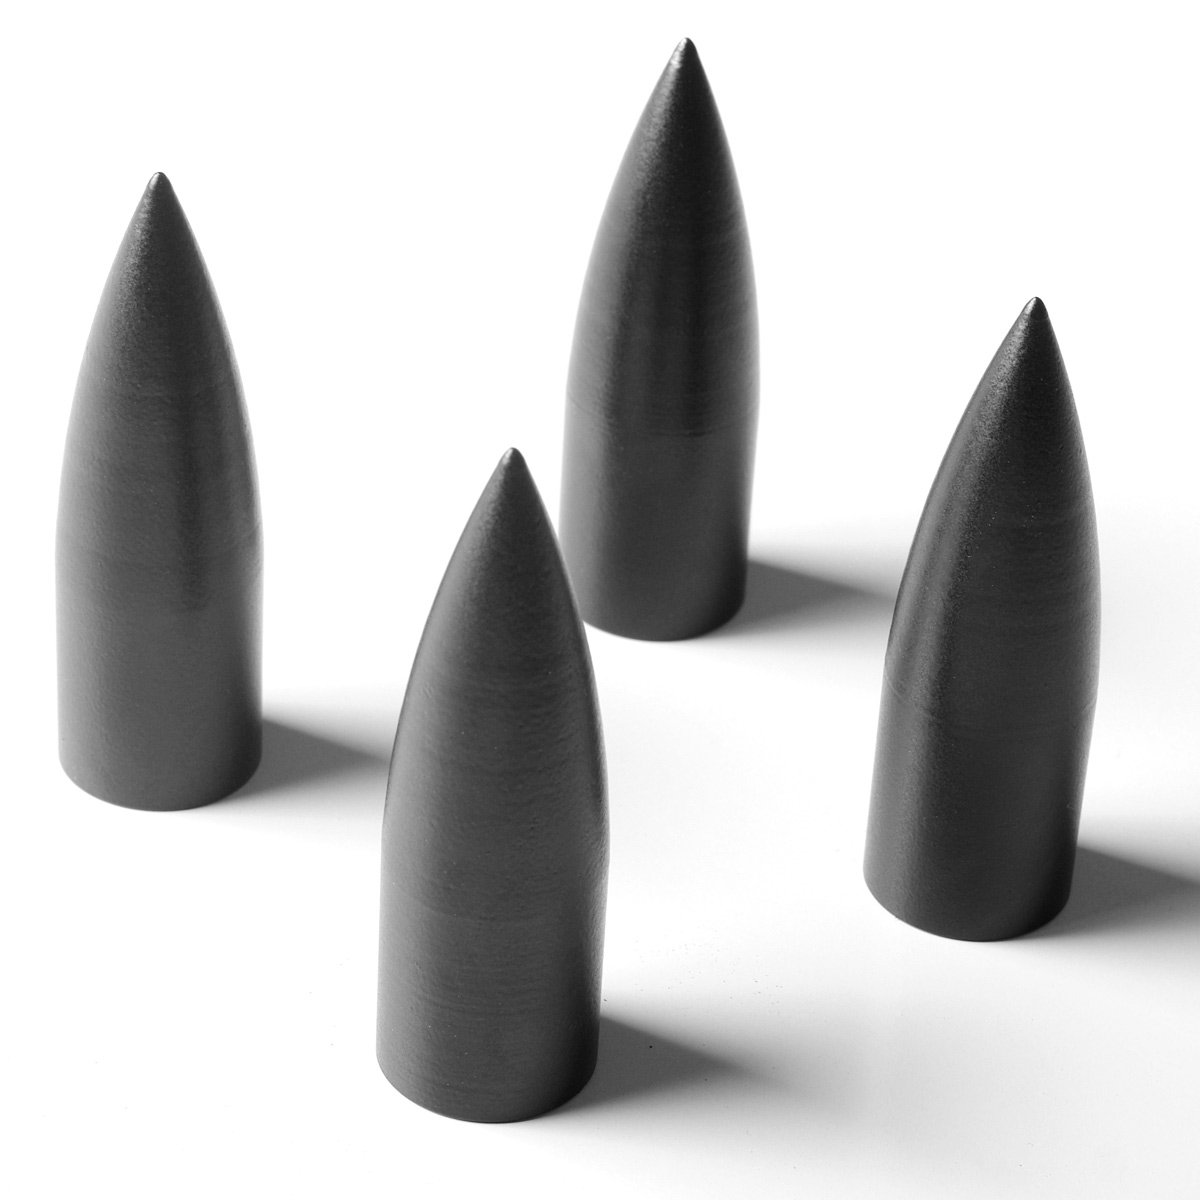 archetype furniture. salamander archetype furniture spikes set of 4 black